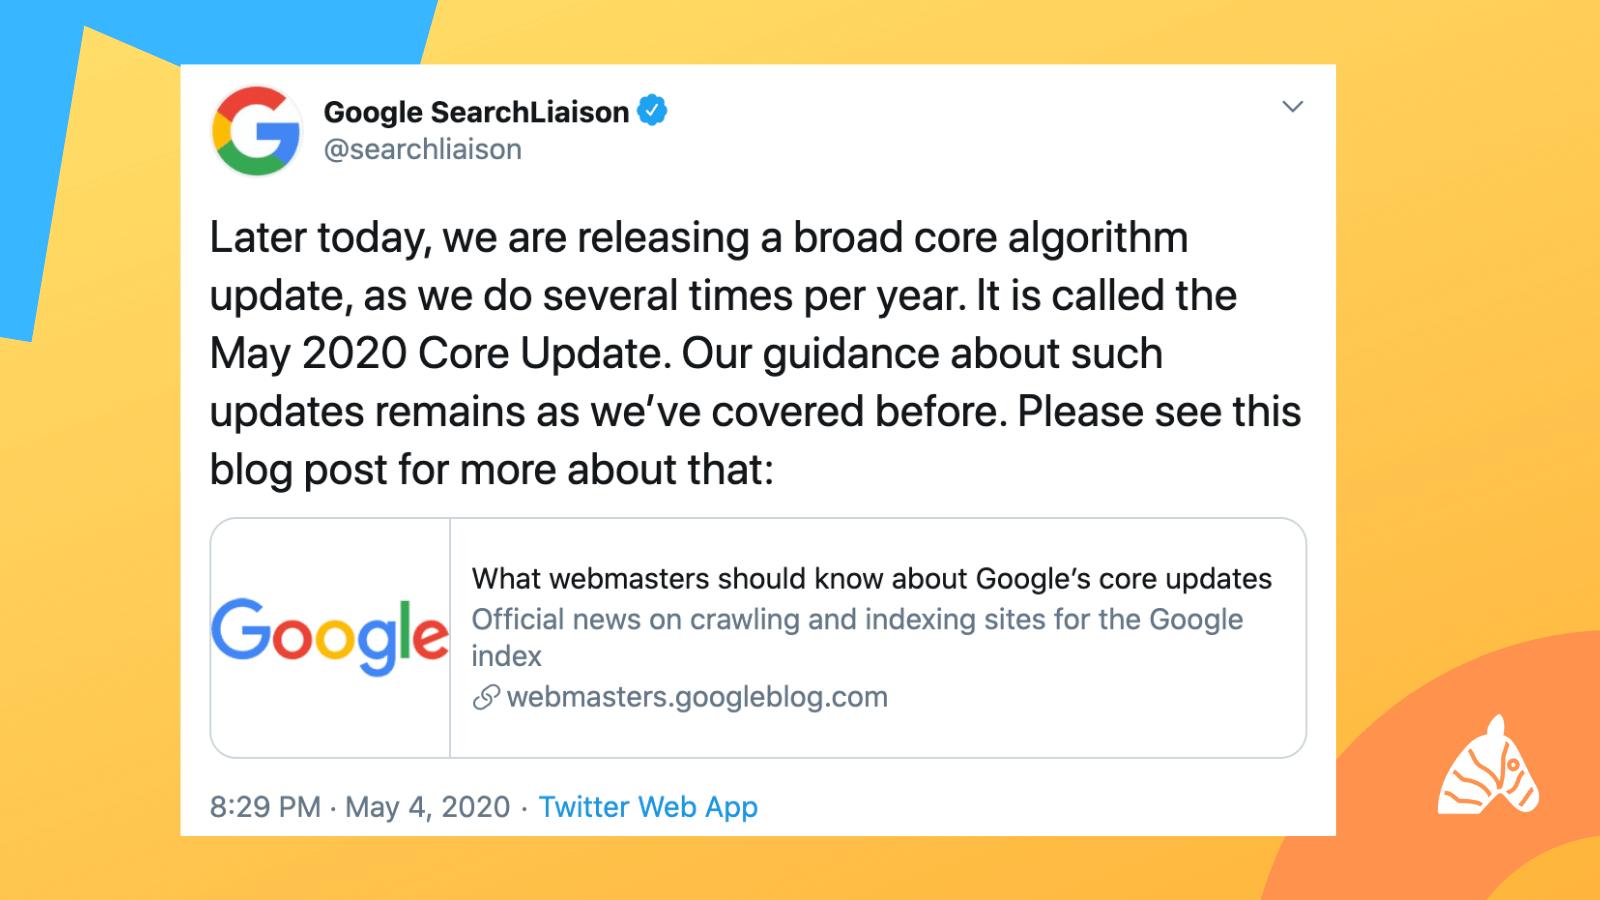 Google Search Liason twitter update regarding the may 2020 core update